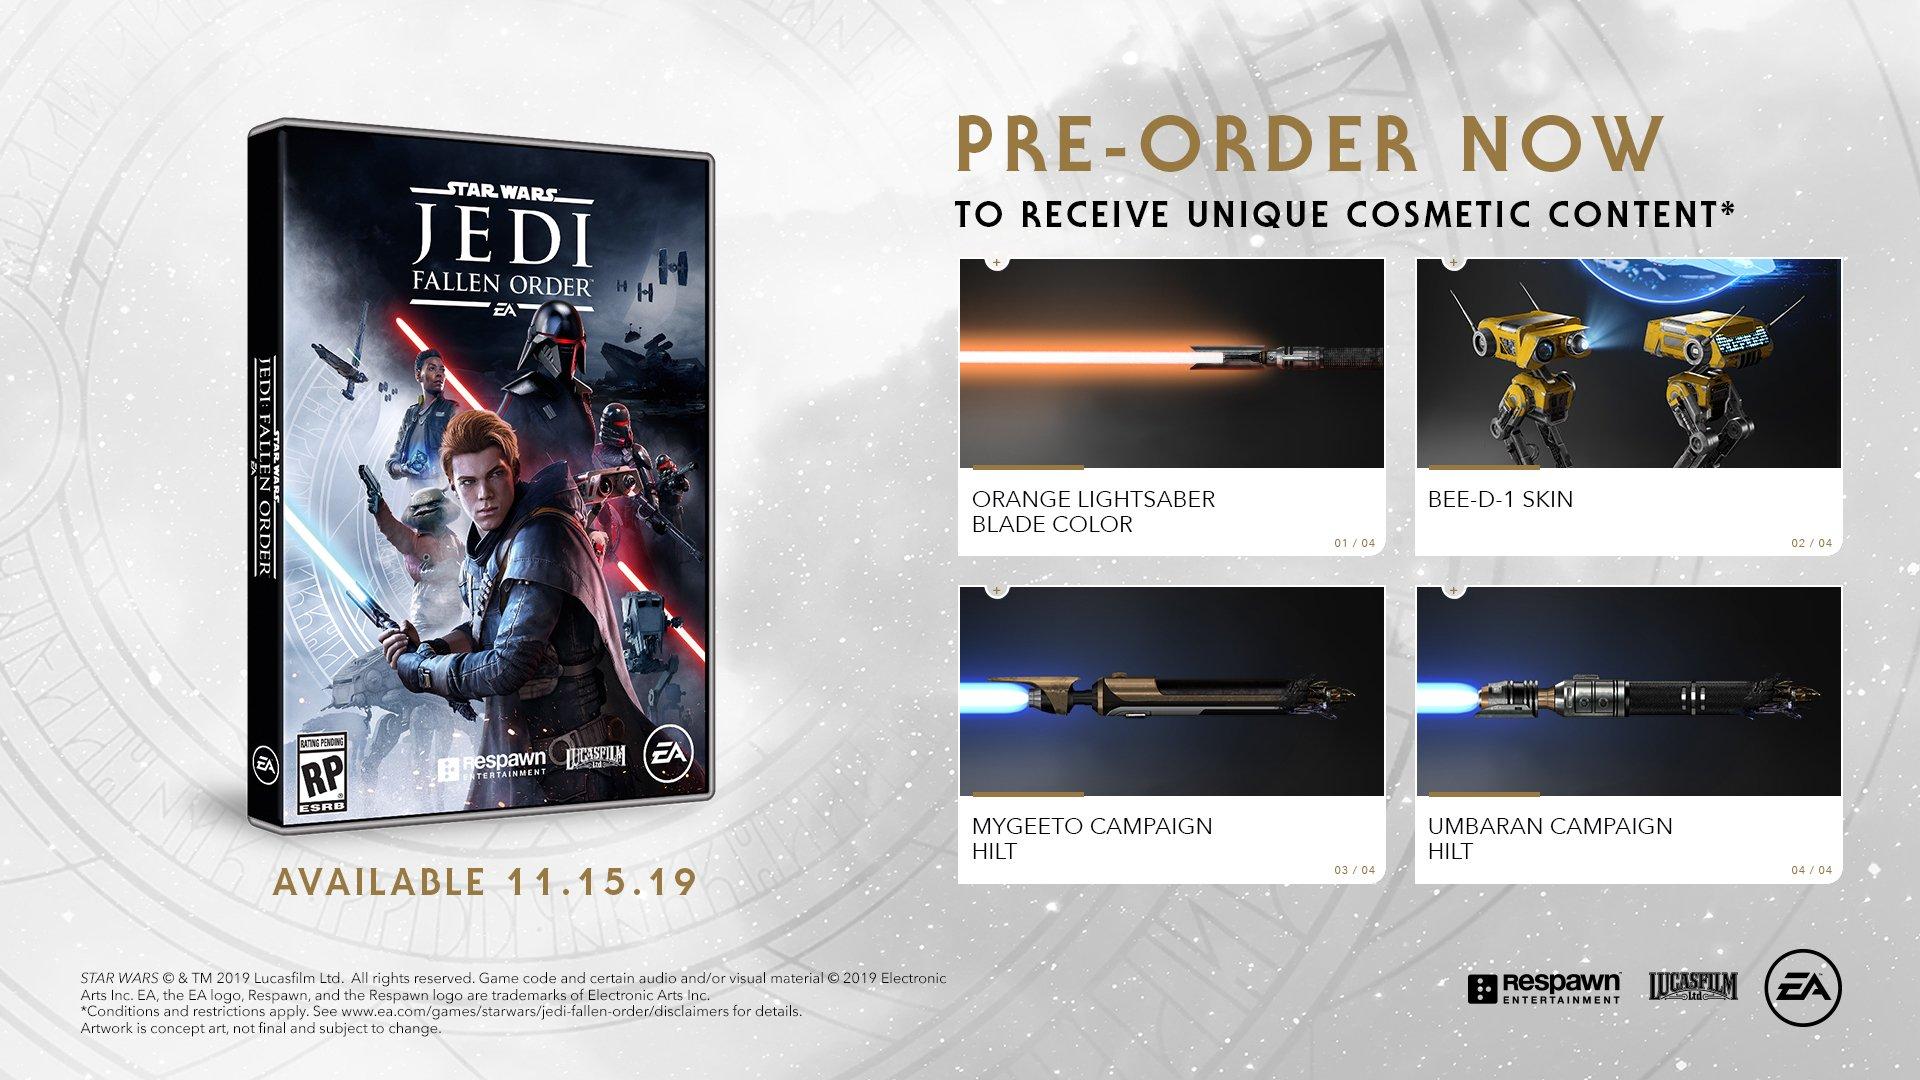 Star Wars Jedi: Fallen Order preorder bonus location